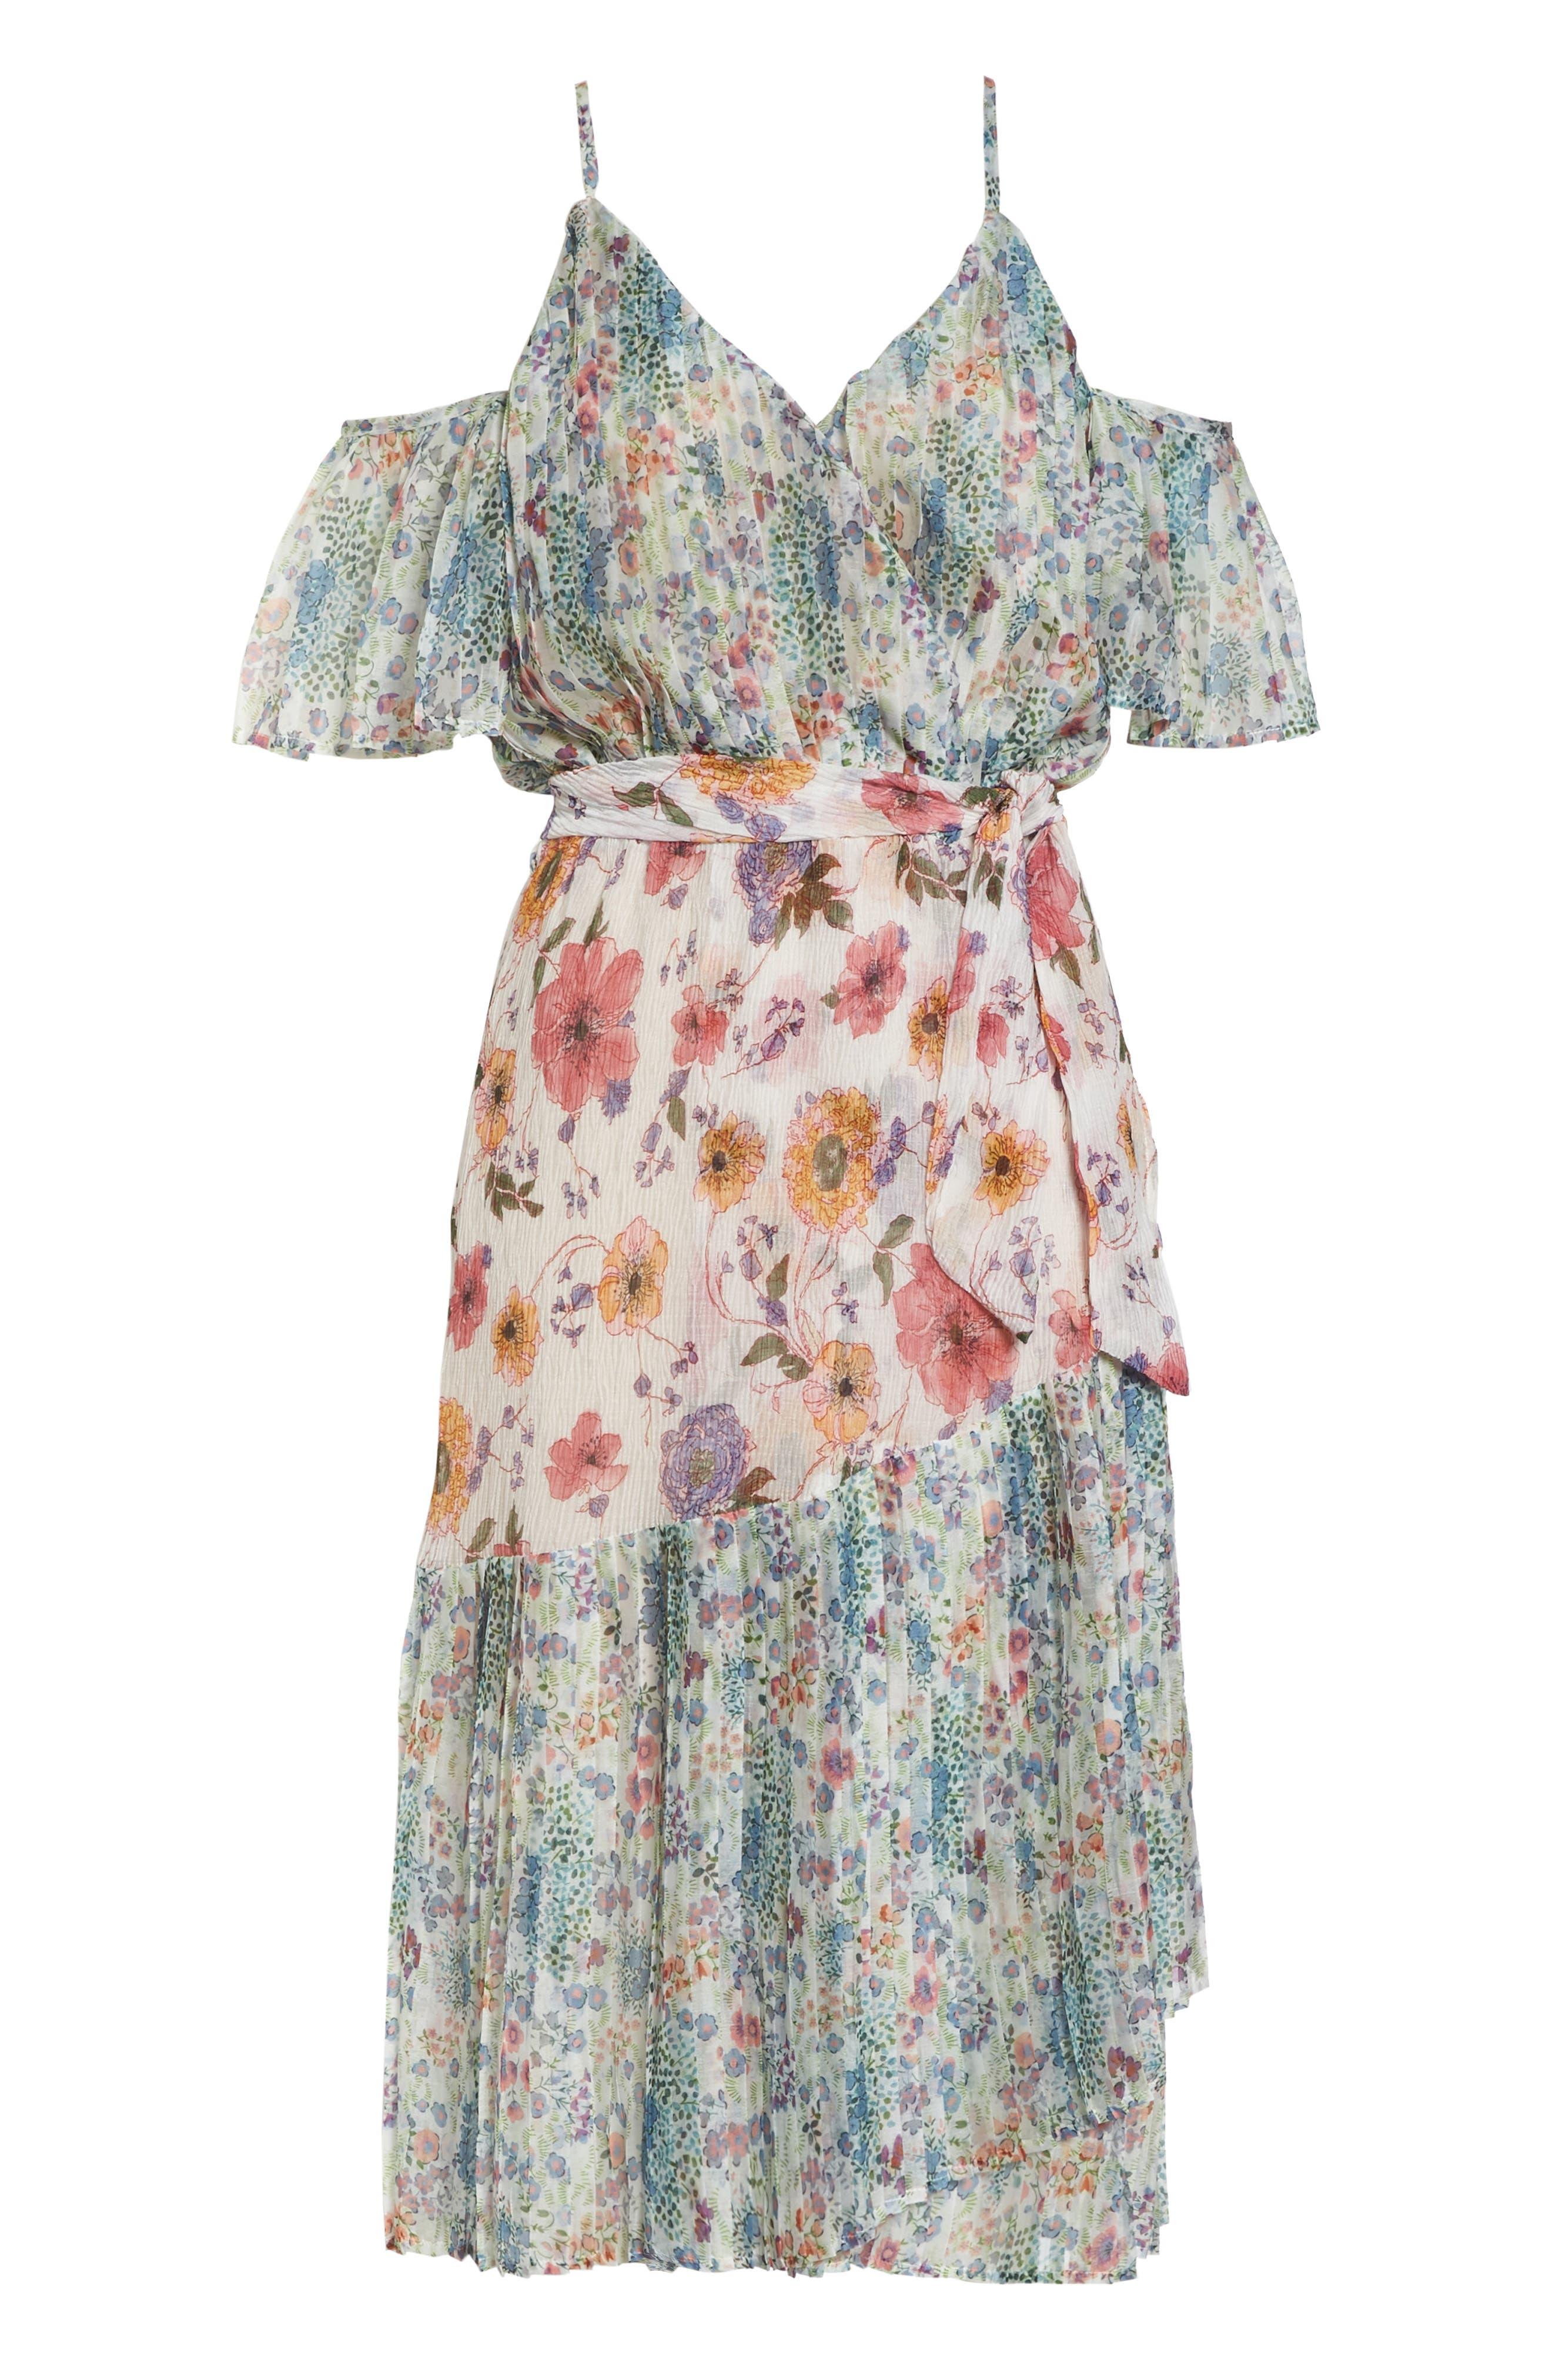 Furiosa Cold Shoulder Dress,                             Alternate thumbnail 7, color,                             Furiosa Multi